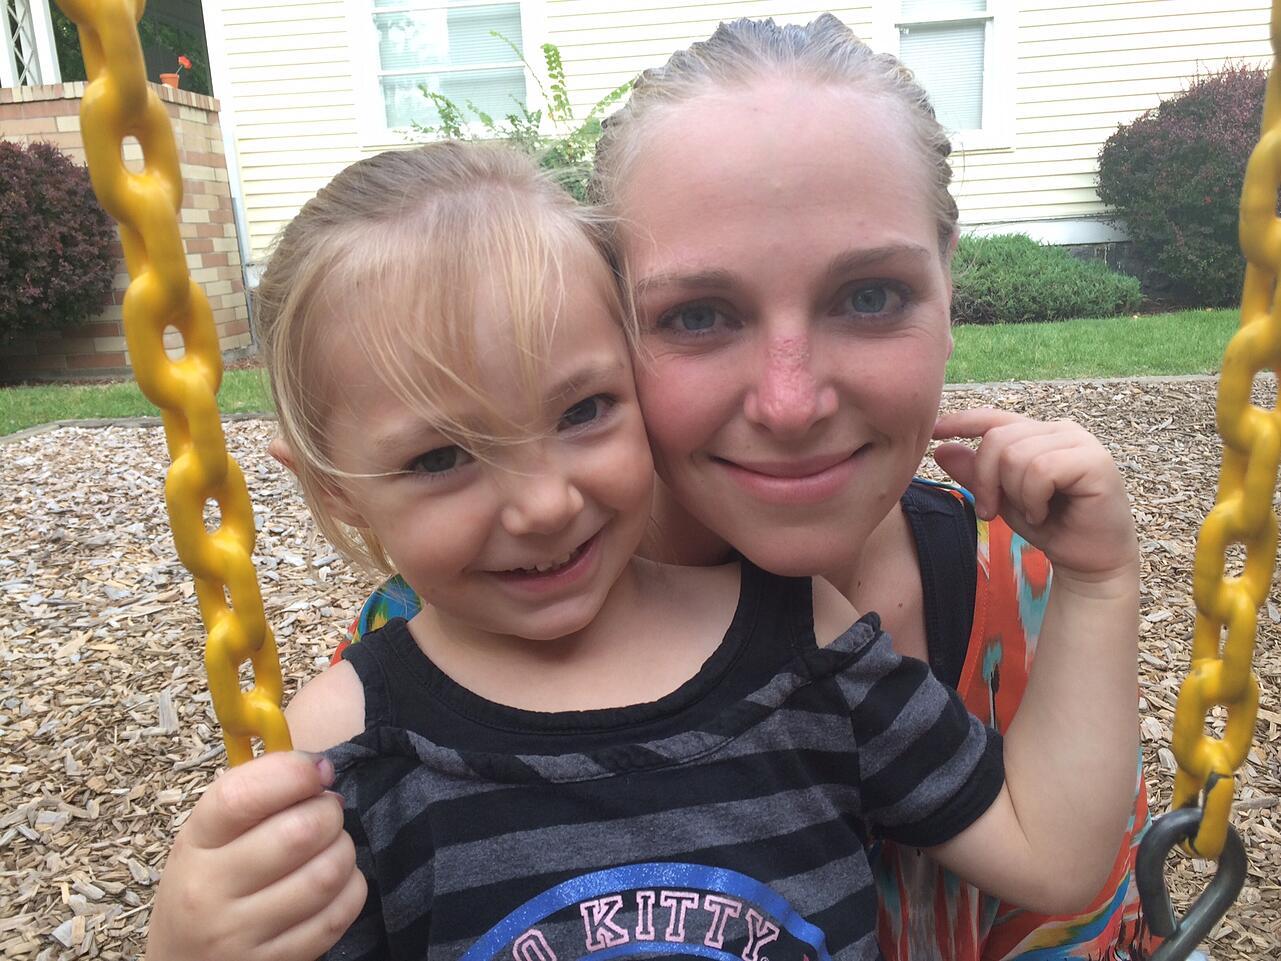 Single_Mom_Amanda_with_daughter_Daisy